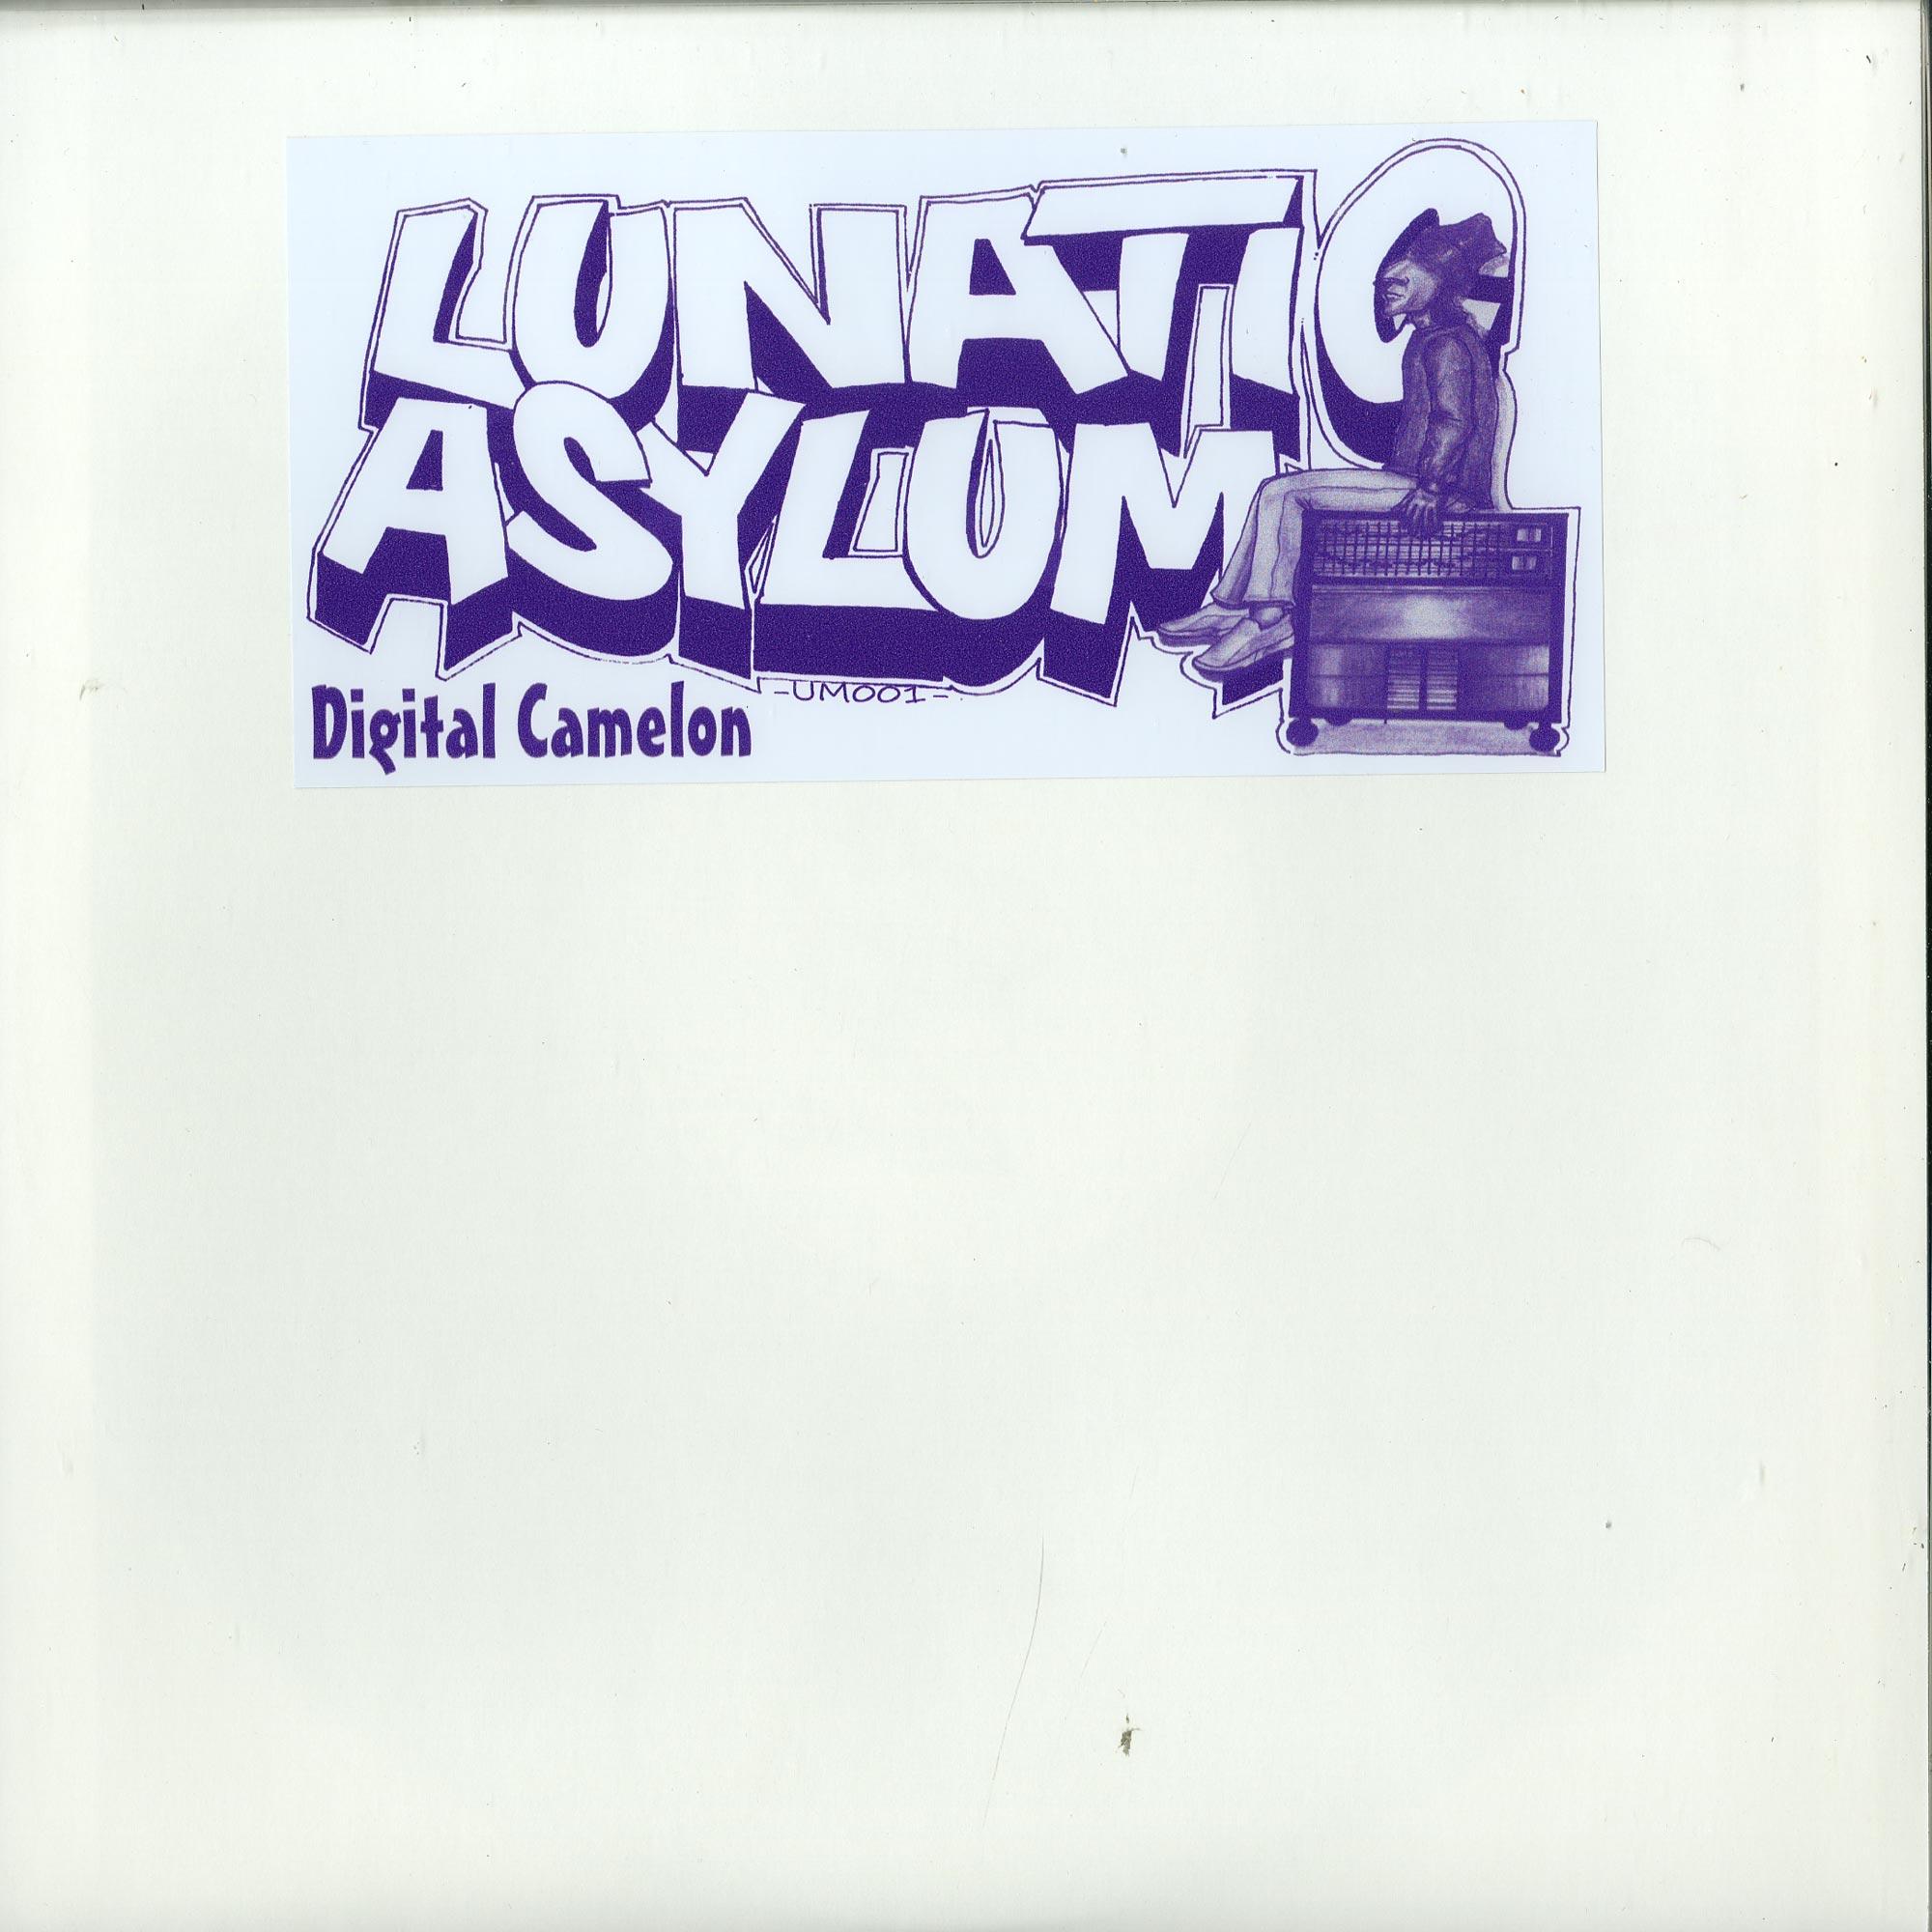 Lunatic Asylum - DIGITAL CAMELON